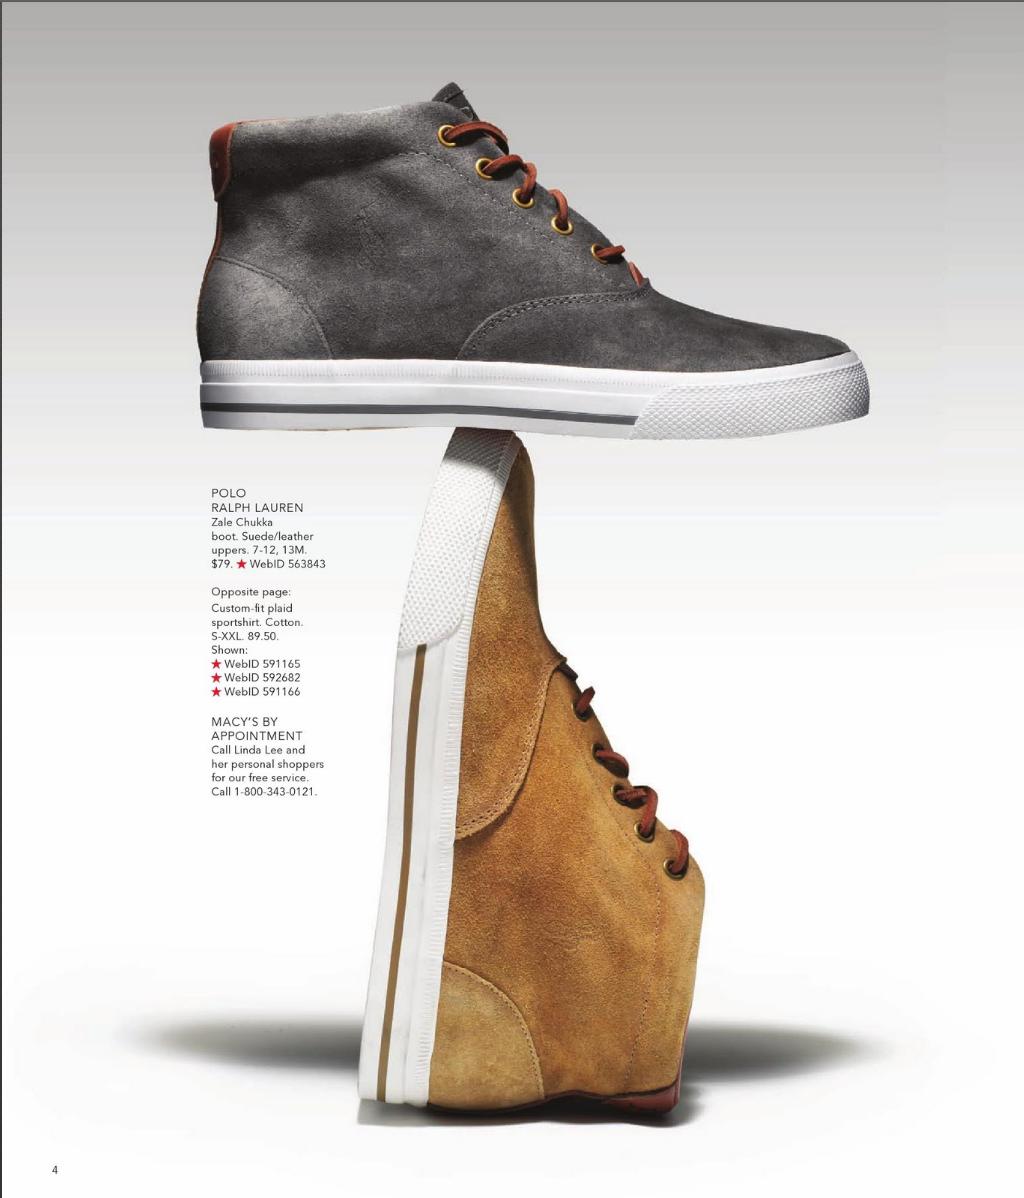 polo ralph lauren shoes photoshoot studio background full